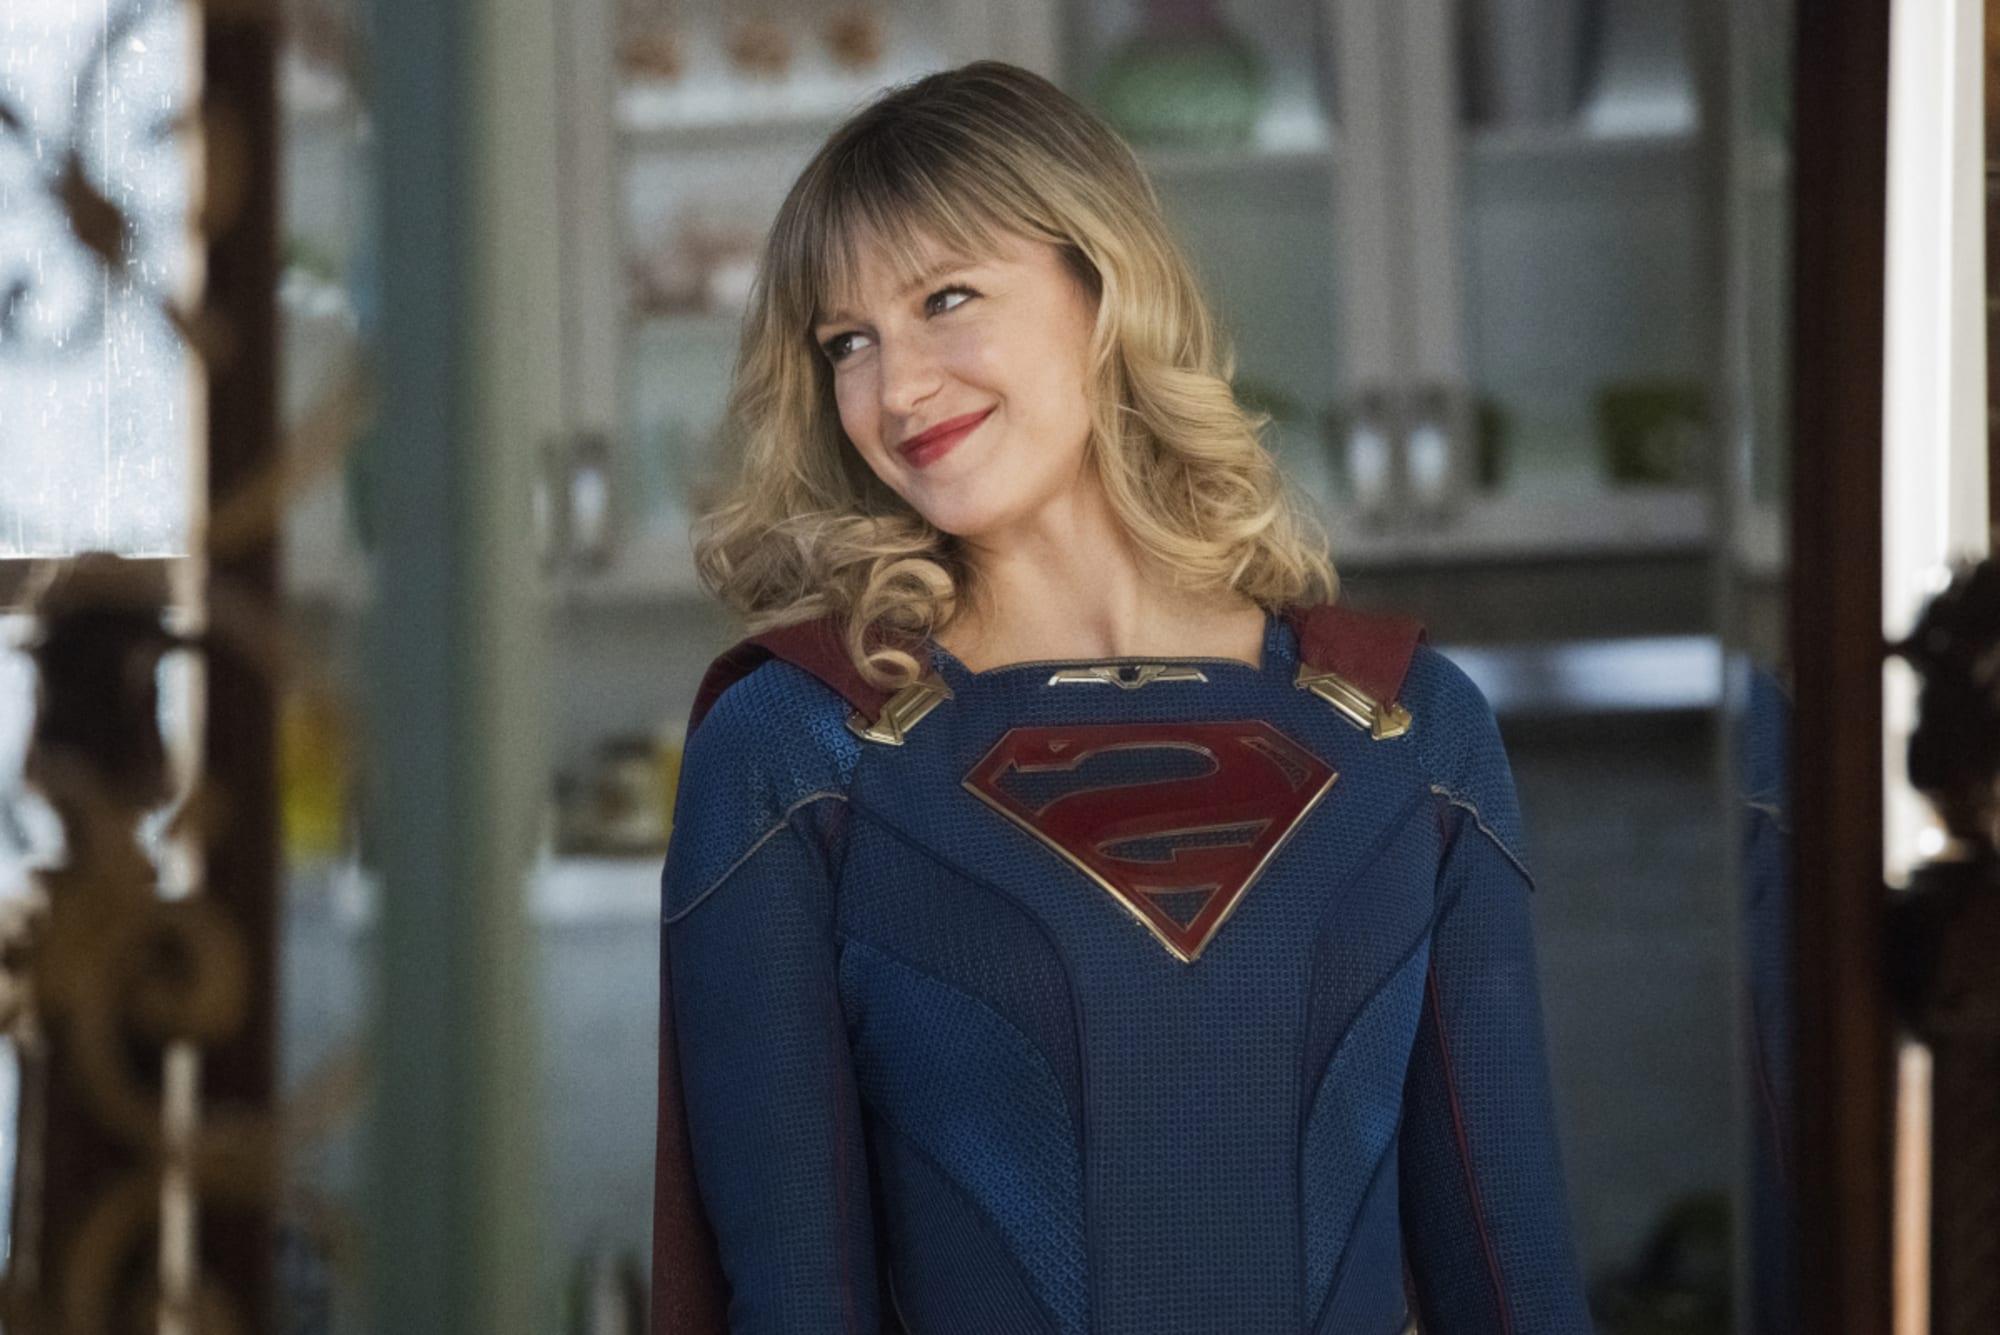 Supergirl season 6: Premiere, release date, cast, trailer and more